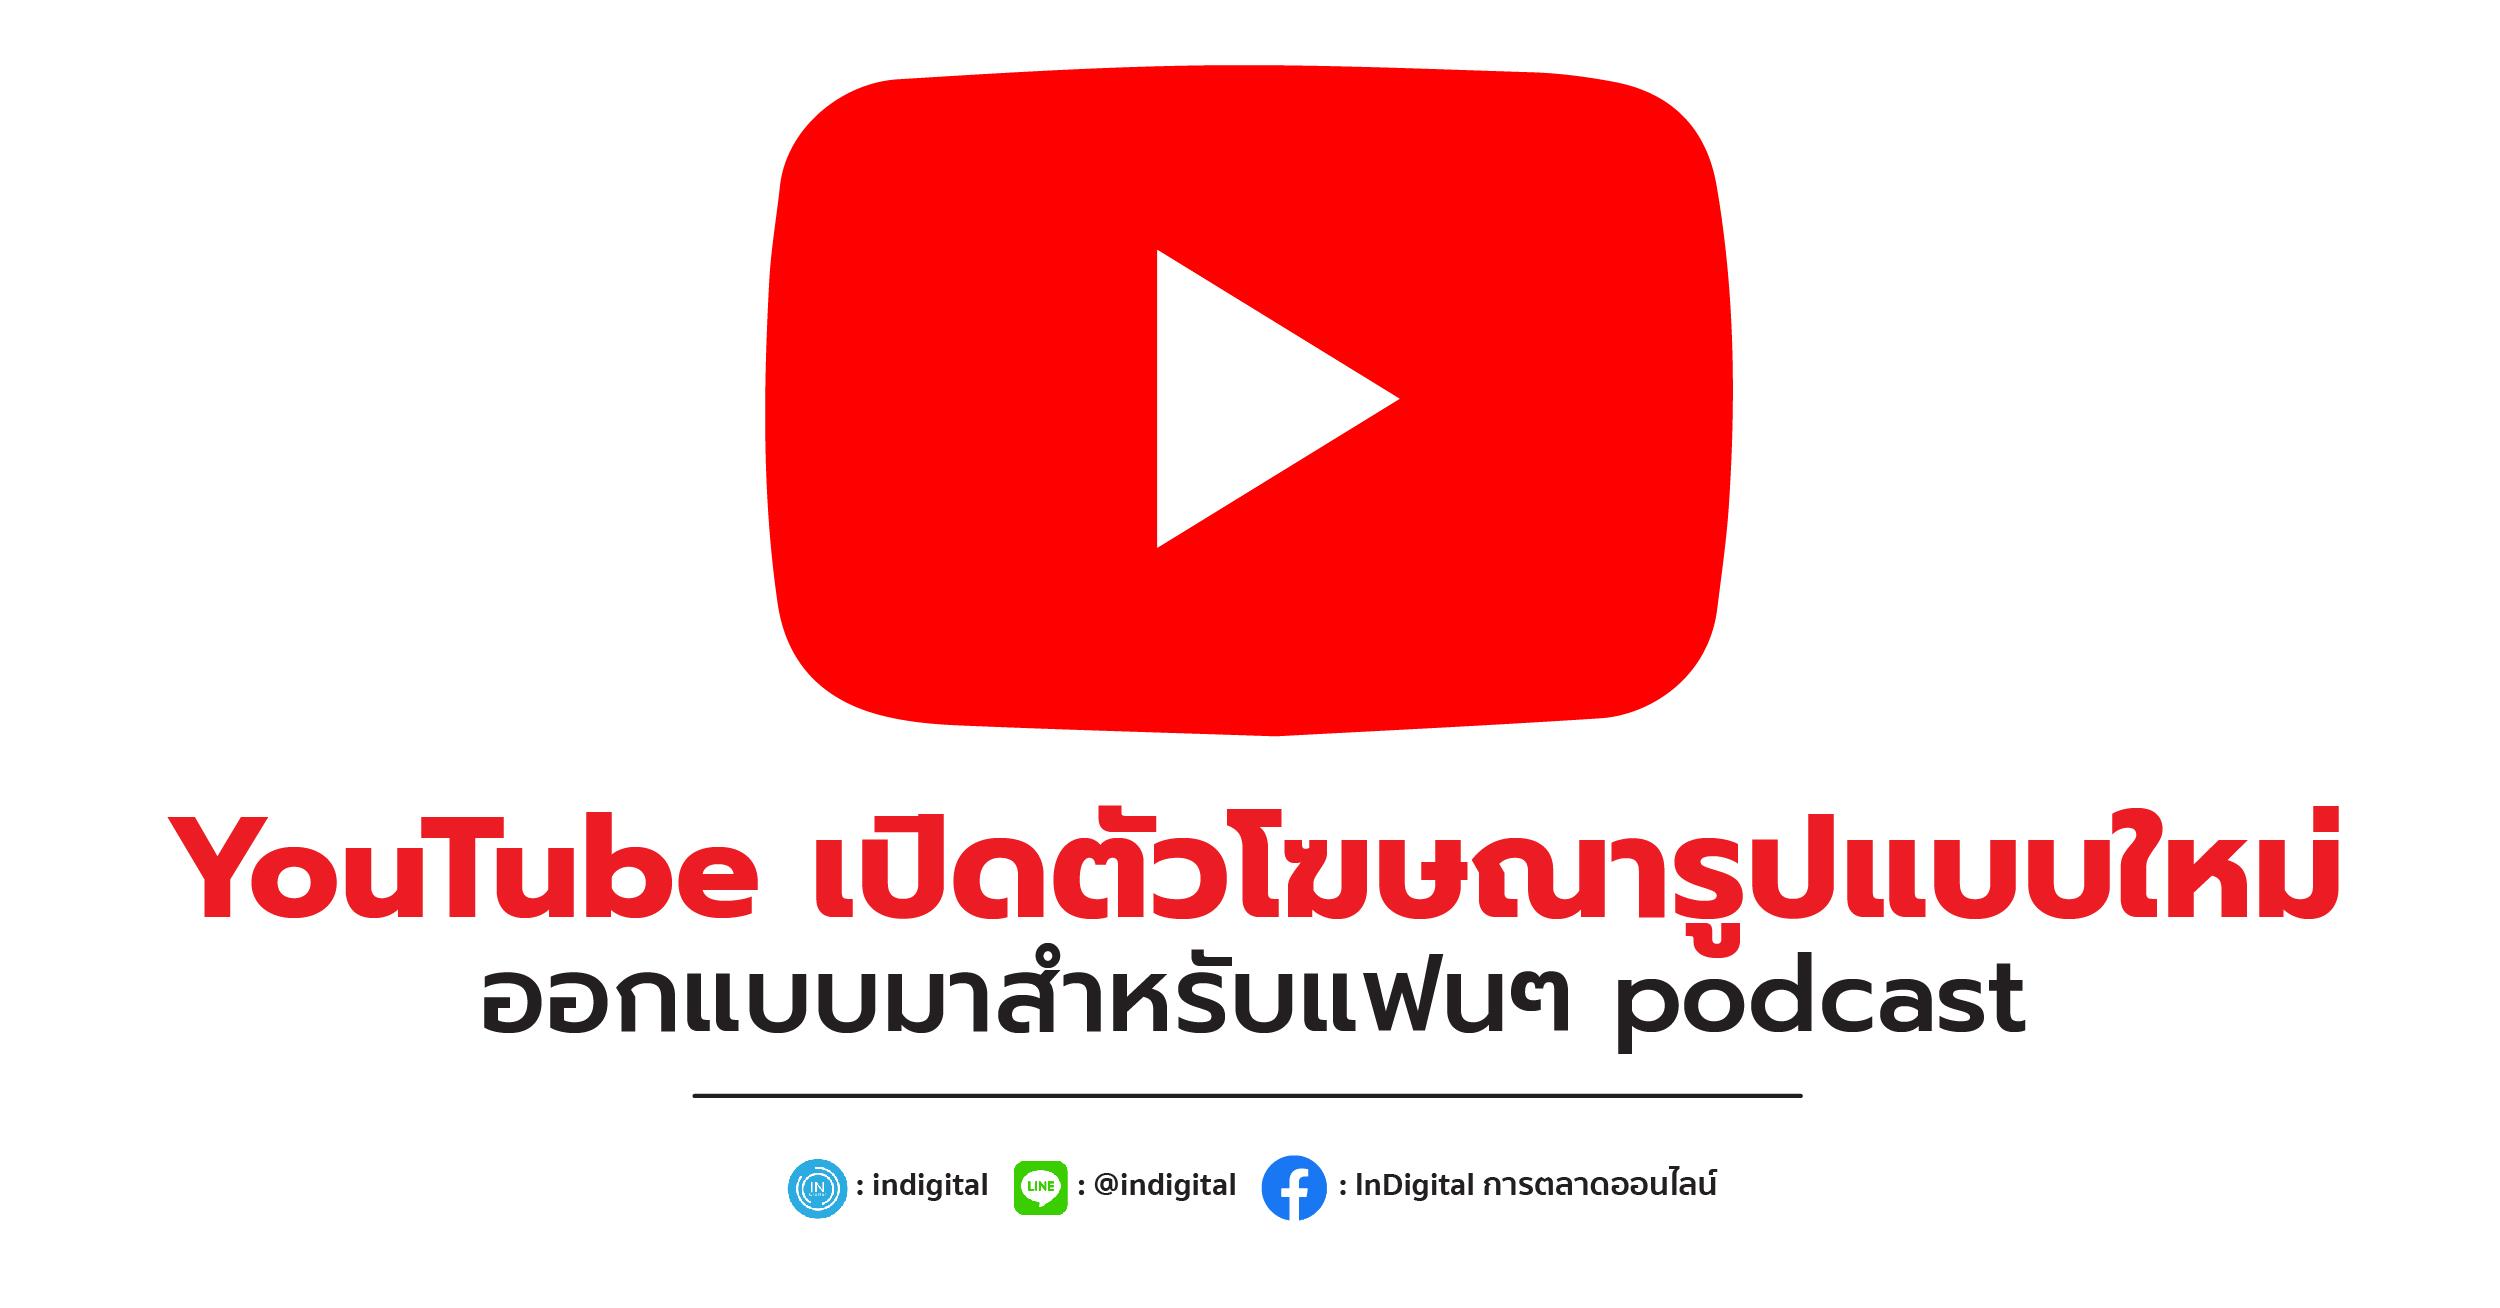 YouTube เปิดตัวโฆษณารูปแบบใหม่ออกแบบมาสำหรับแฟนๆ podcast